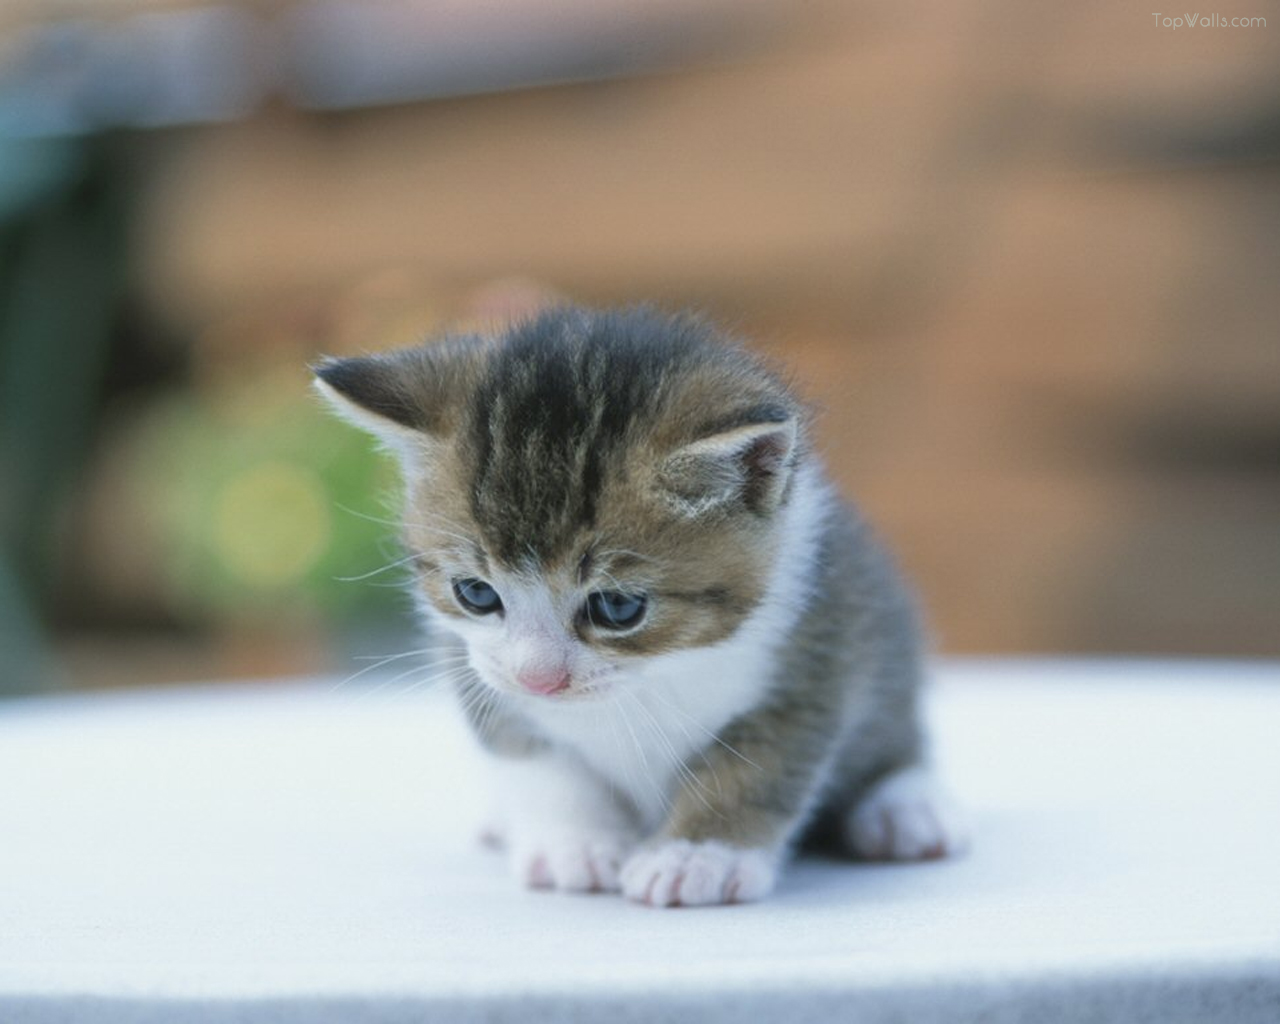 Wallpaper Kucing Anak Kucing Lucu Imut Gambar Foto Wallpaper